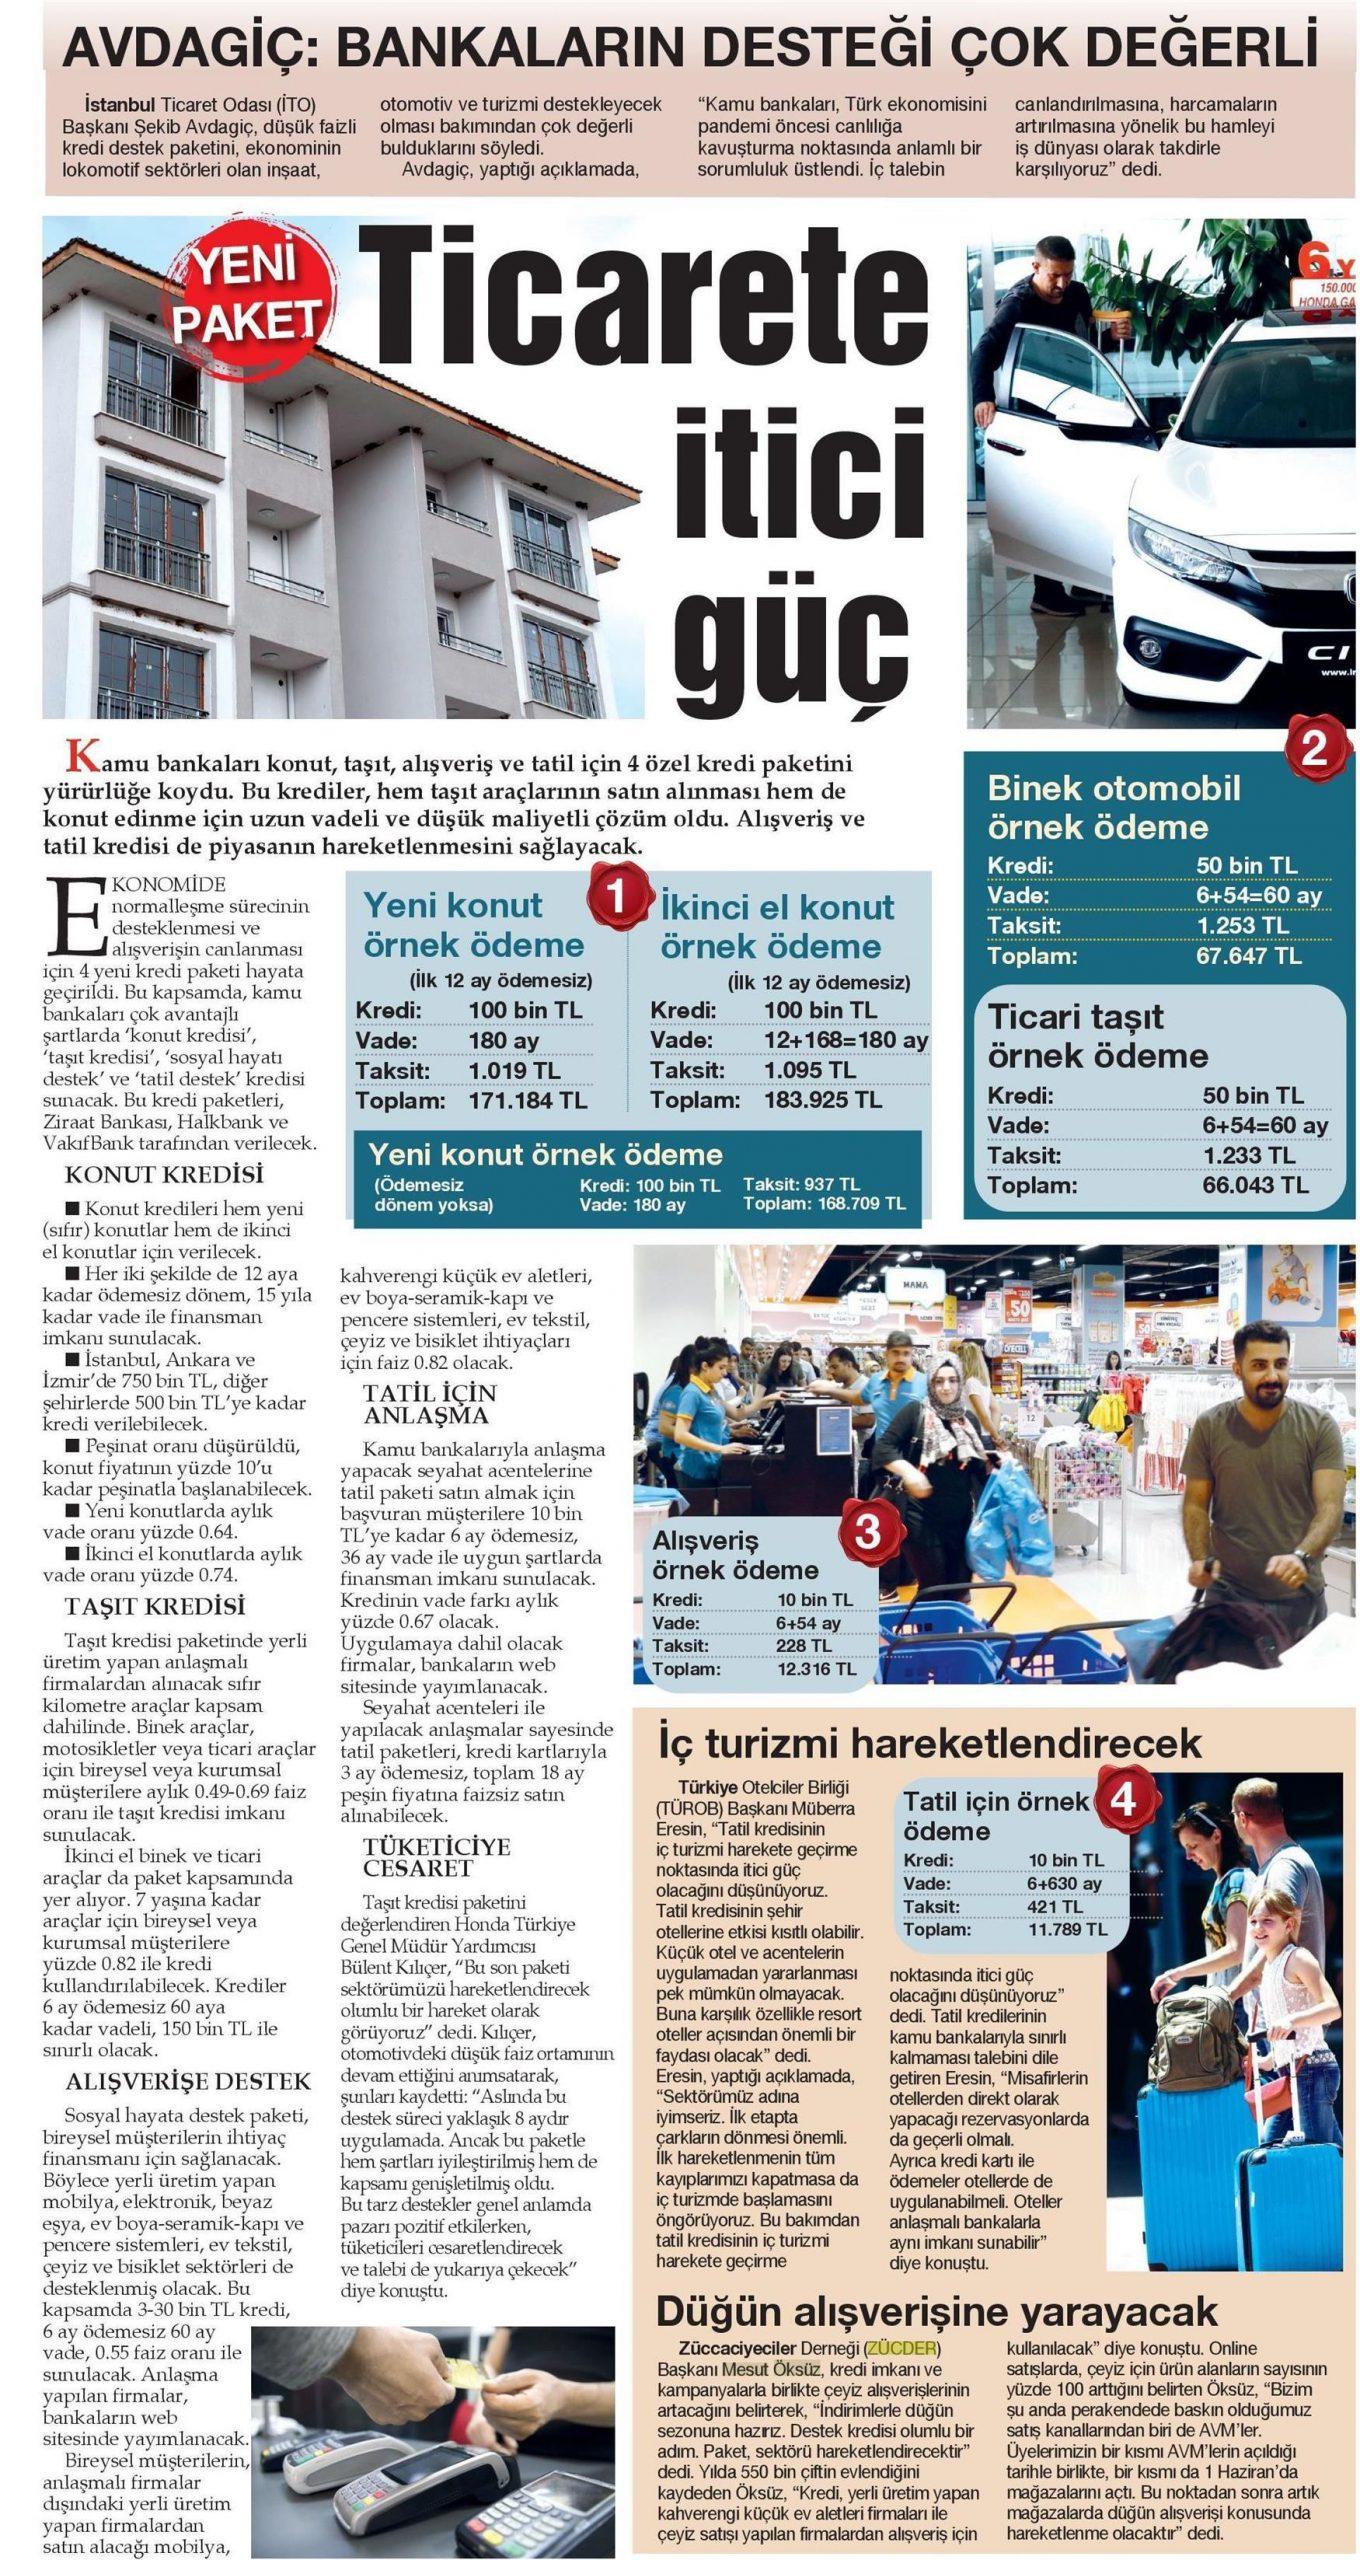 Zücder Ticaret Gazetesi 2. 05.06.2020